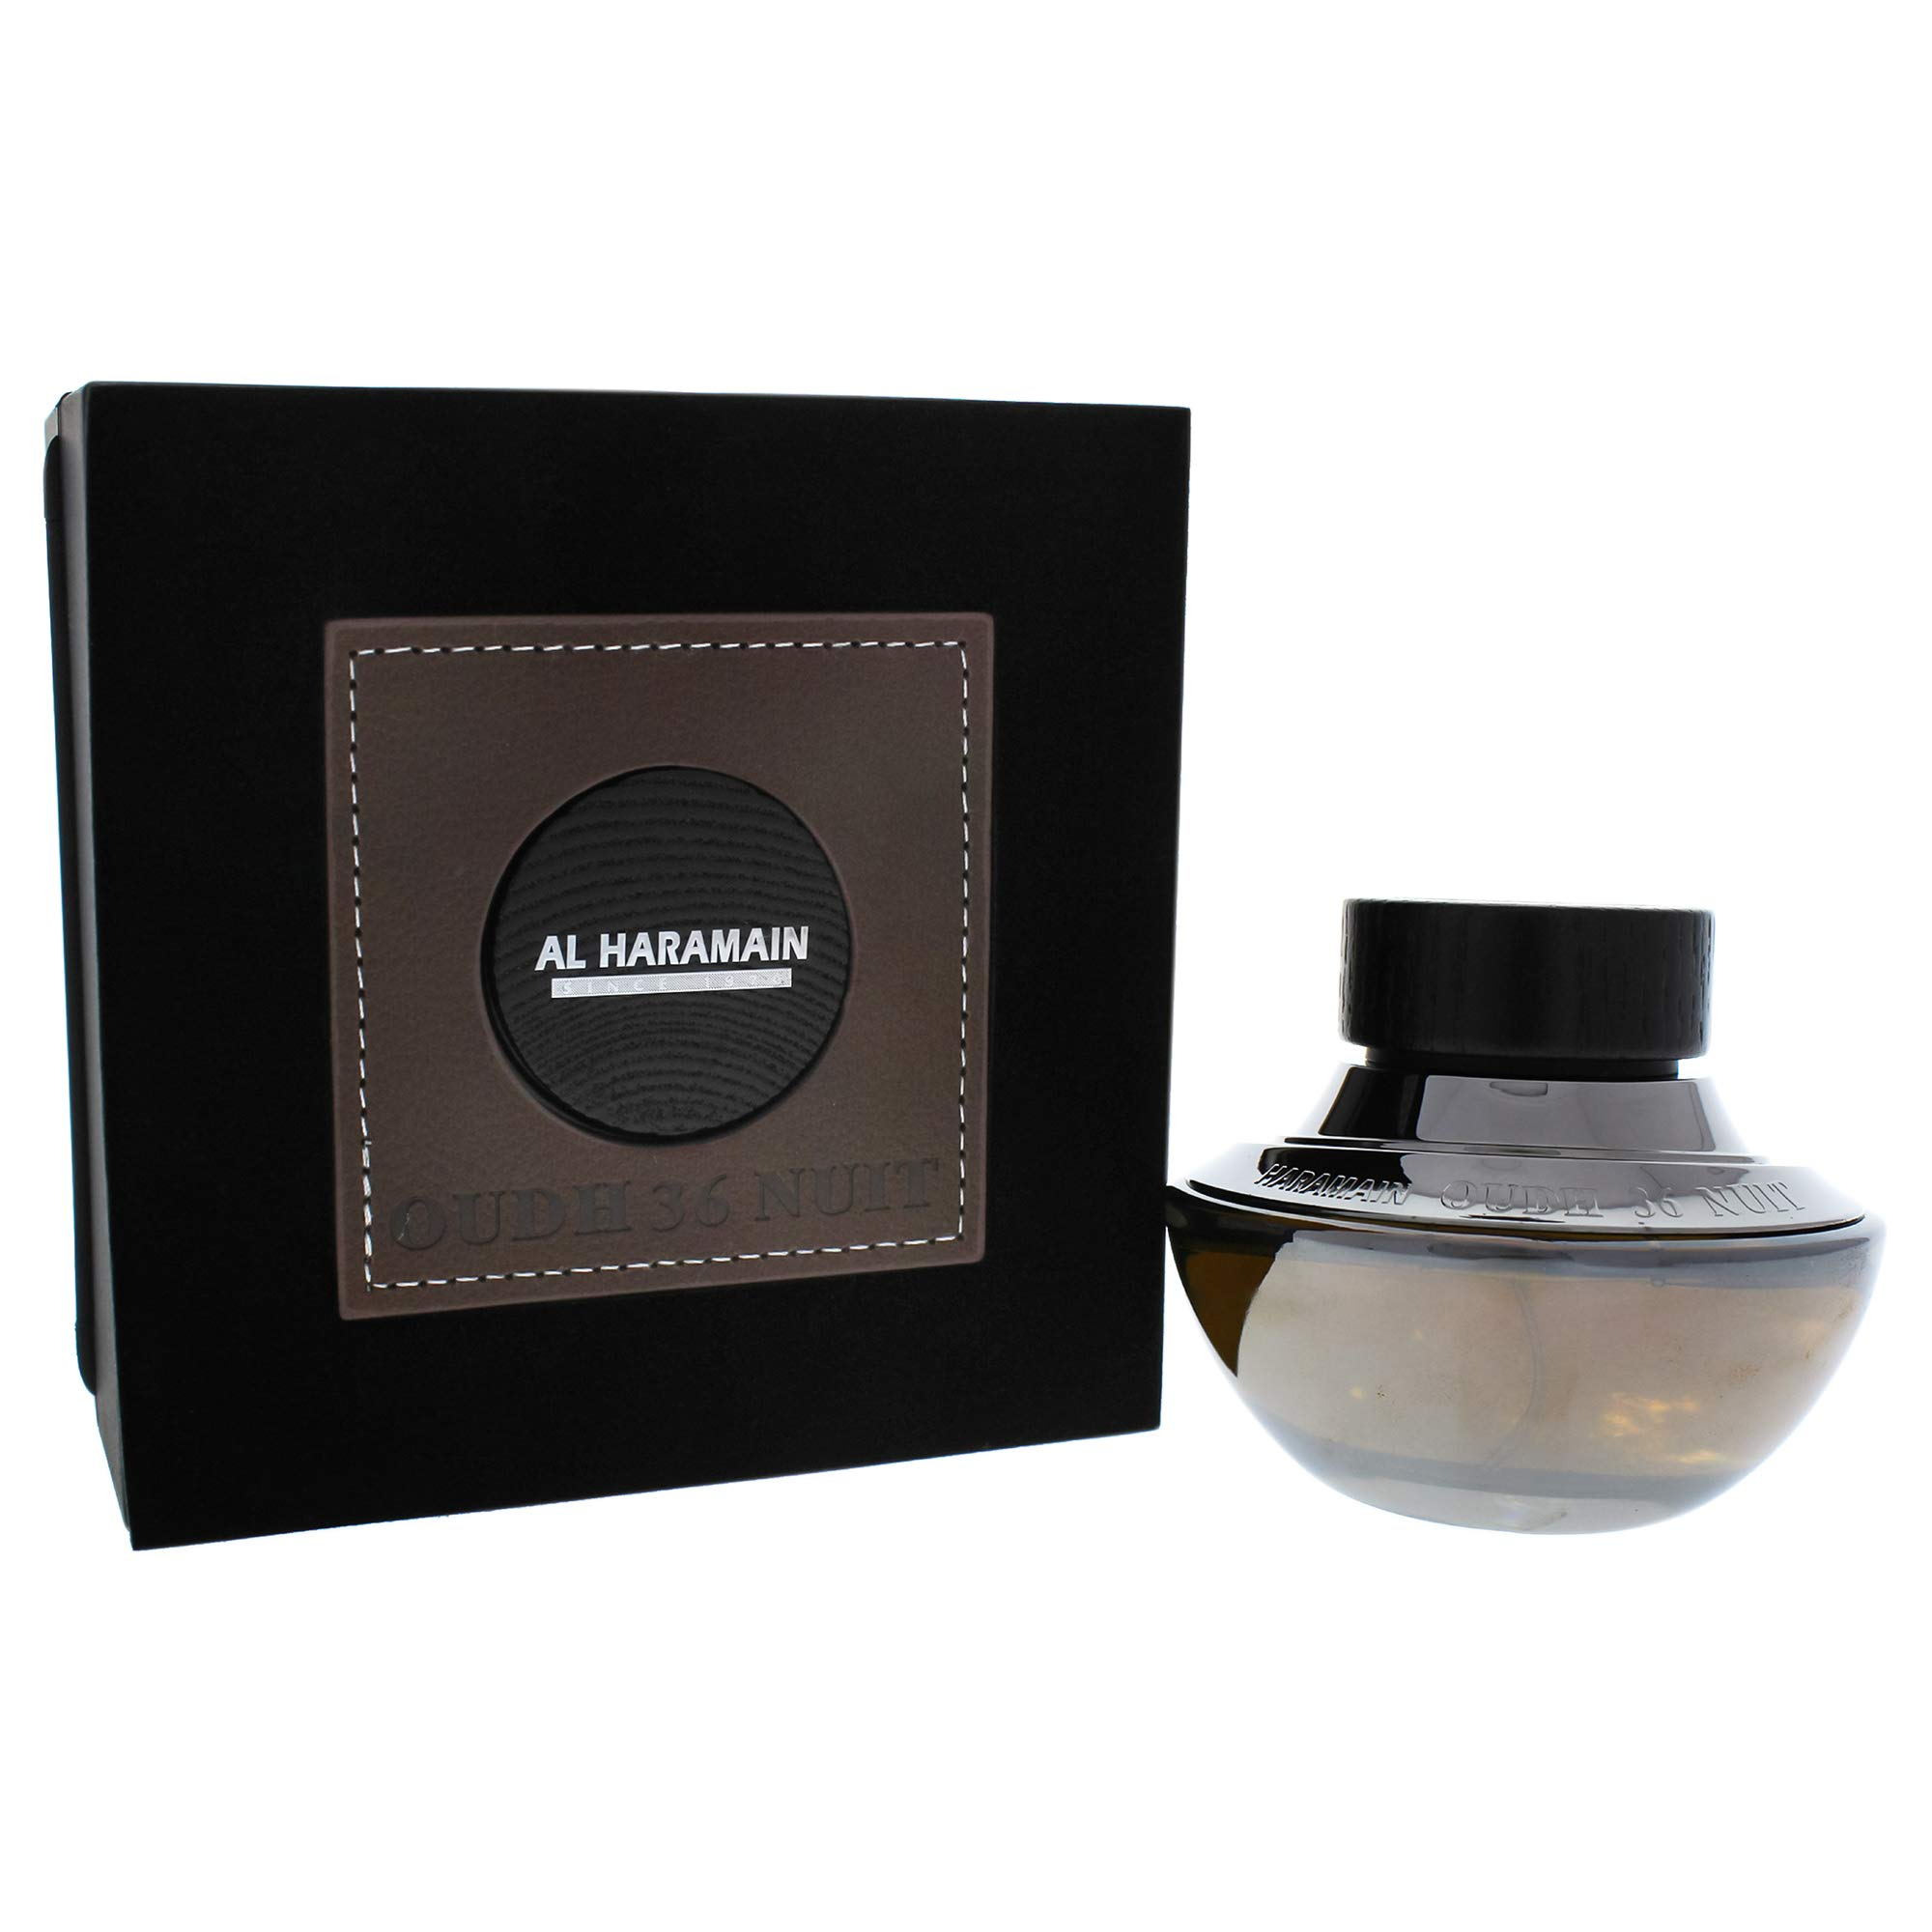 Oudh 36 Nuit by Al Haramain 2.5 oz Eau de Parfum Spray